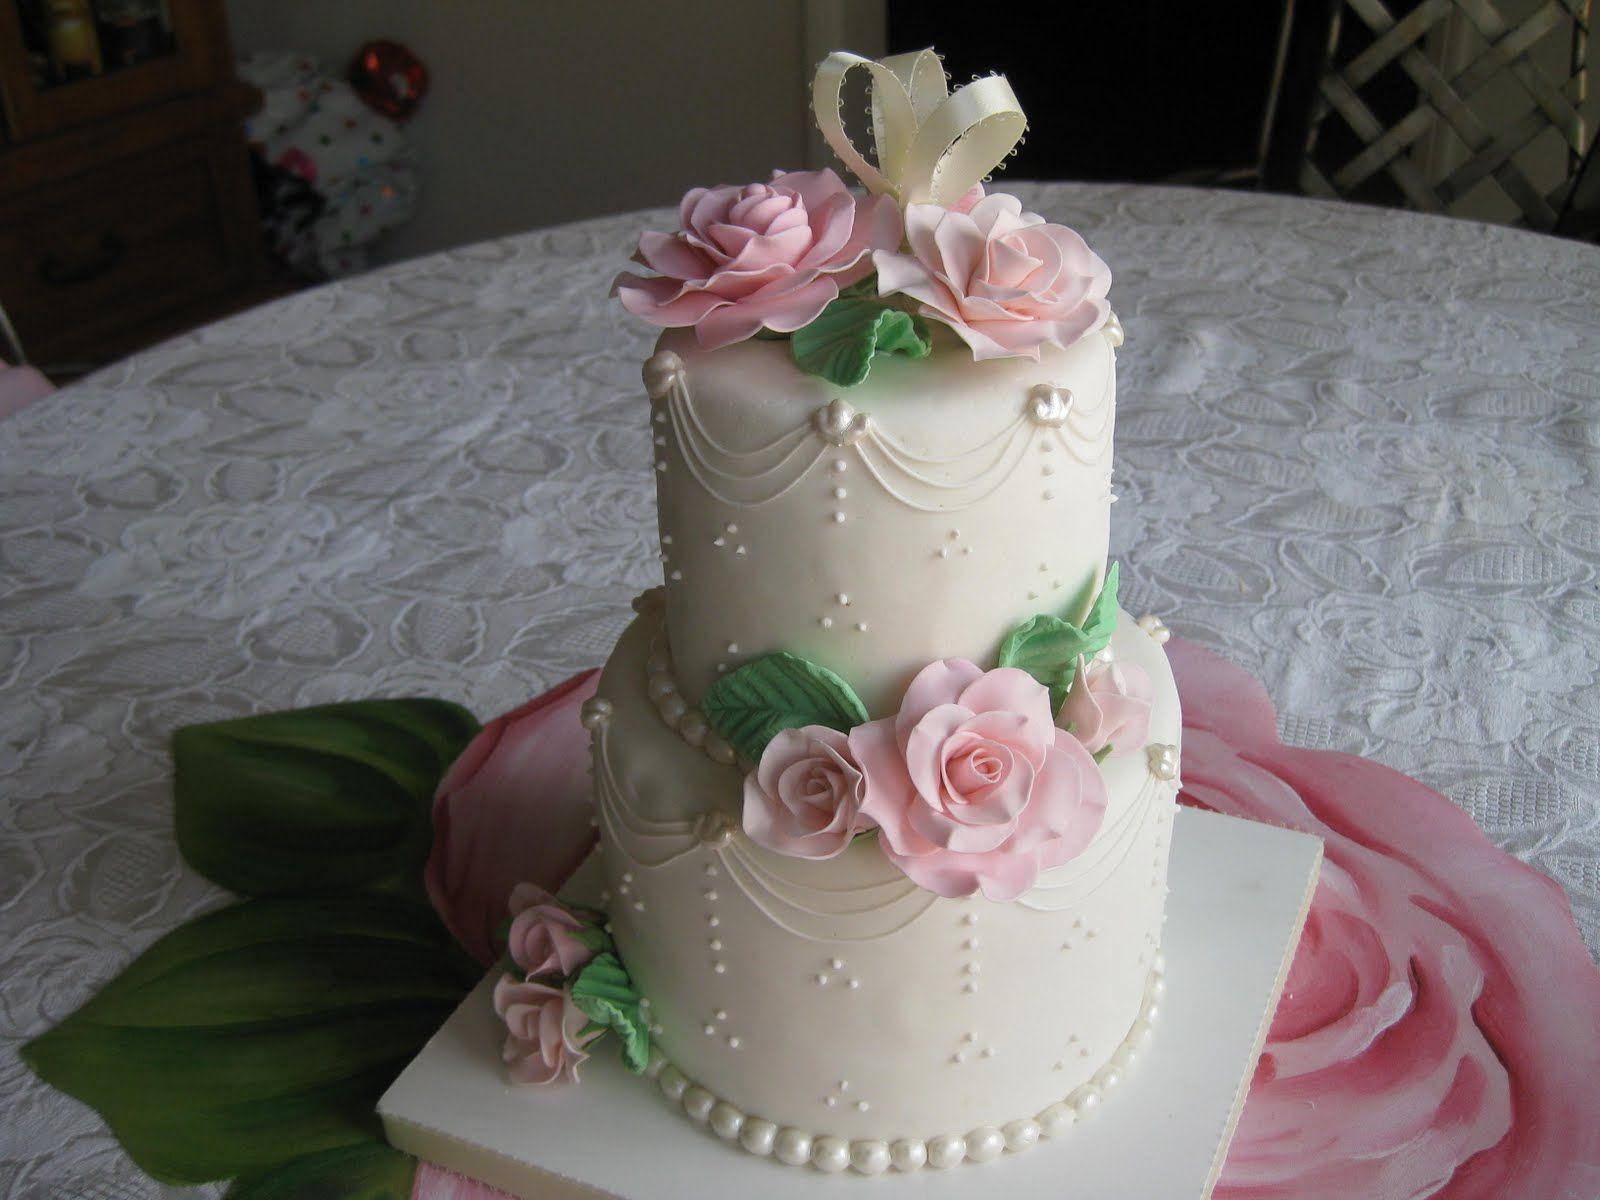 Zombie wedding decorations  Super pretty mini tiered cake  Amazing Cakes  Pinterest  Tiered